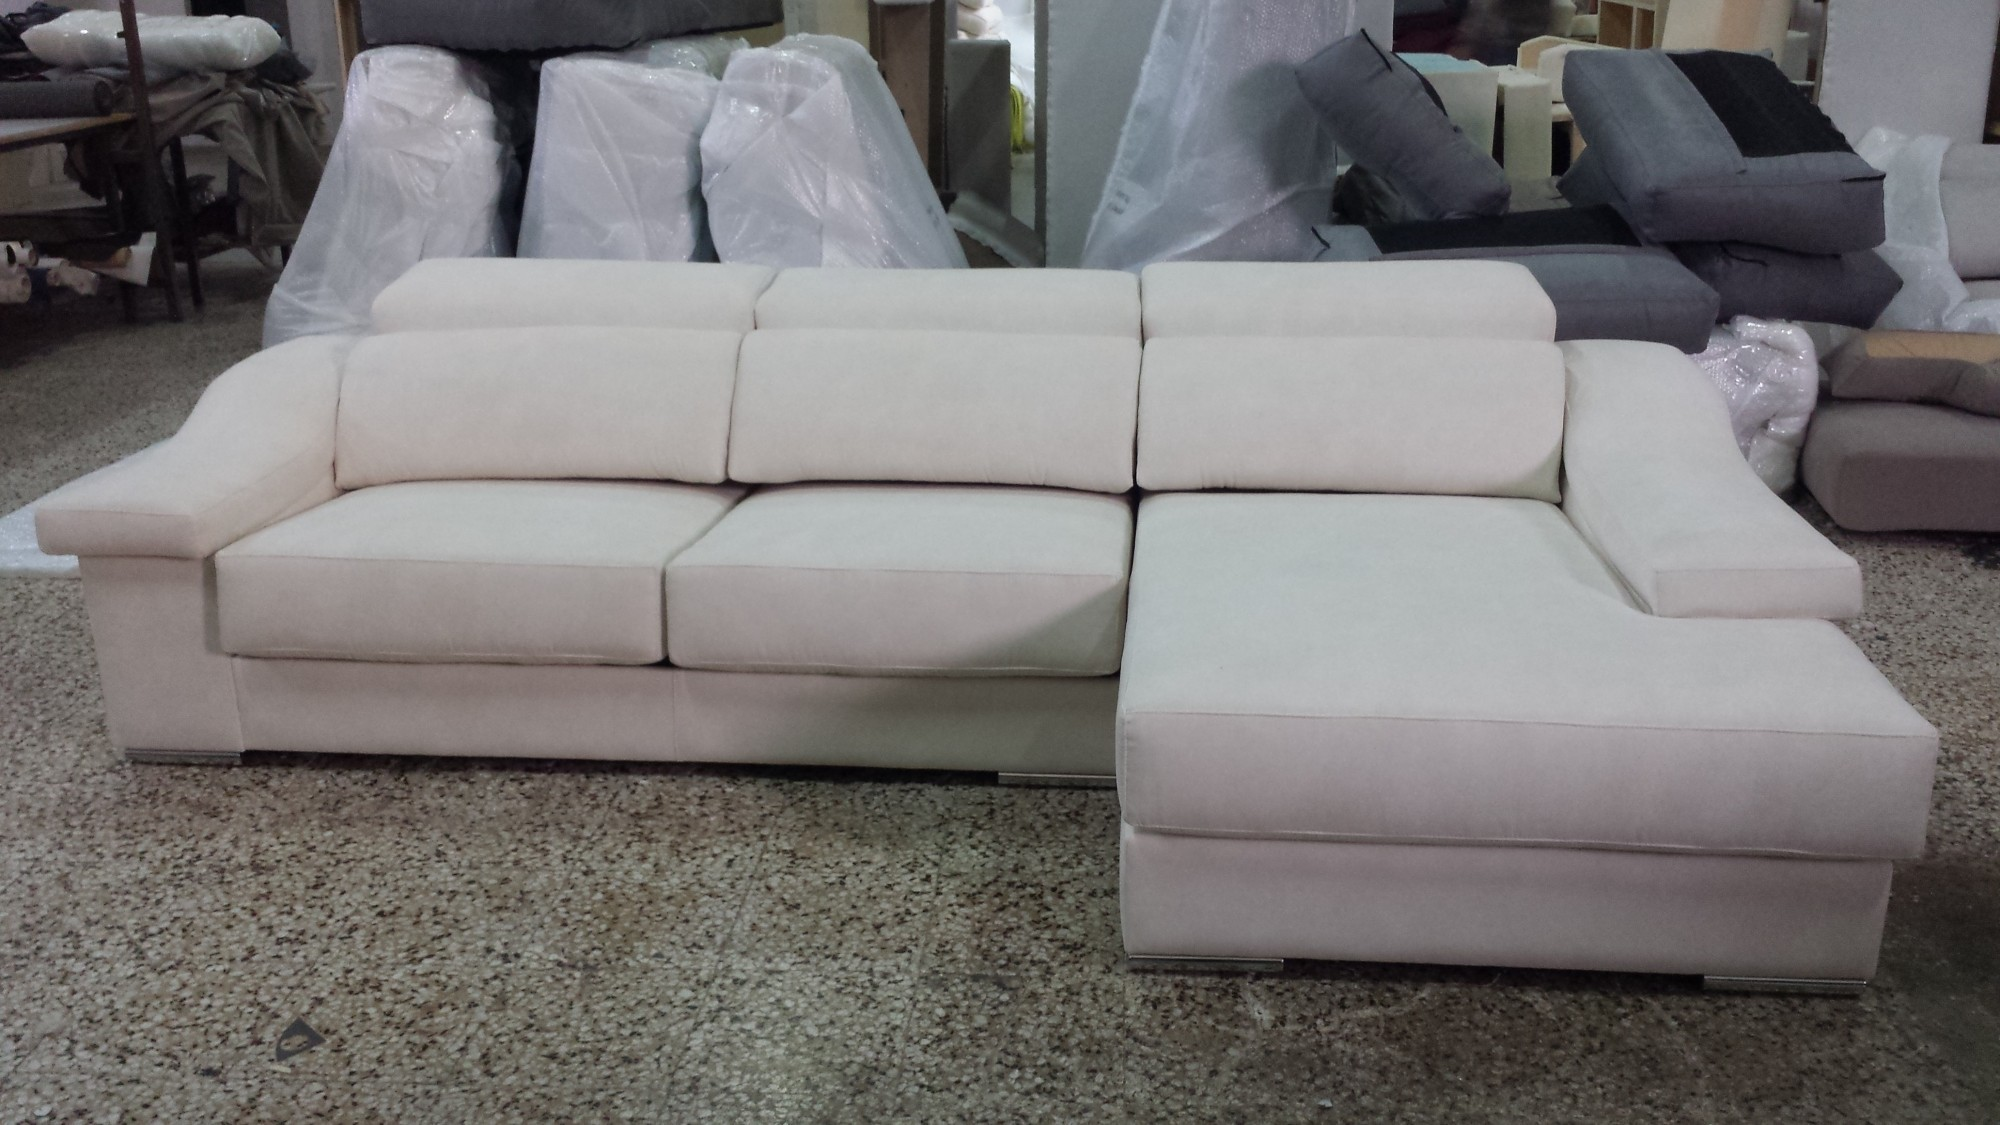 Tiendas de sofas en liquidacion barcelona for Sofas baratos barcelona